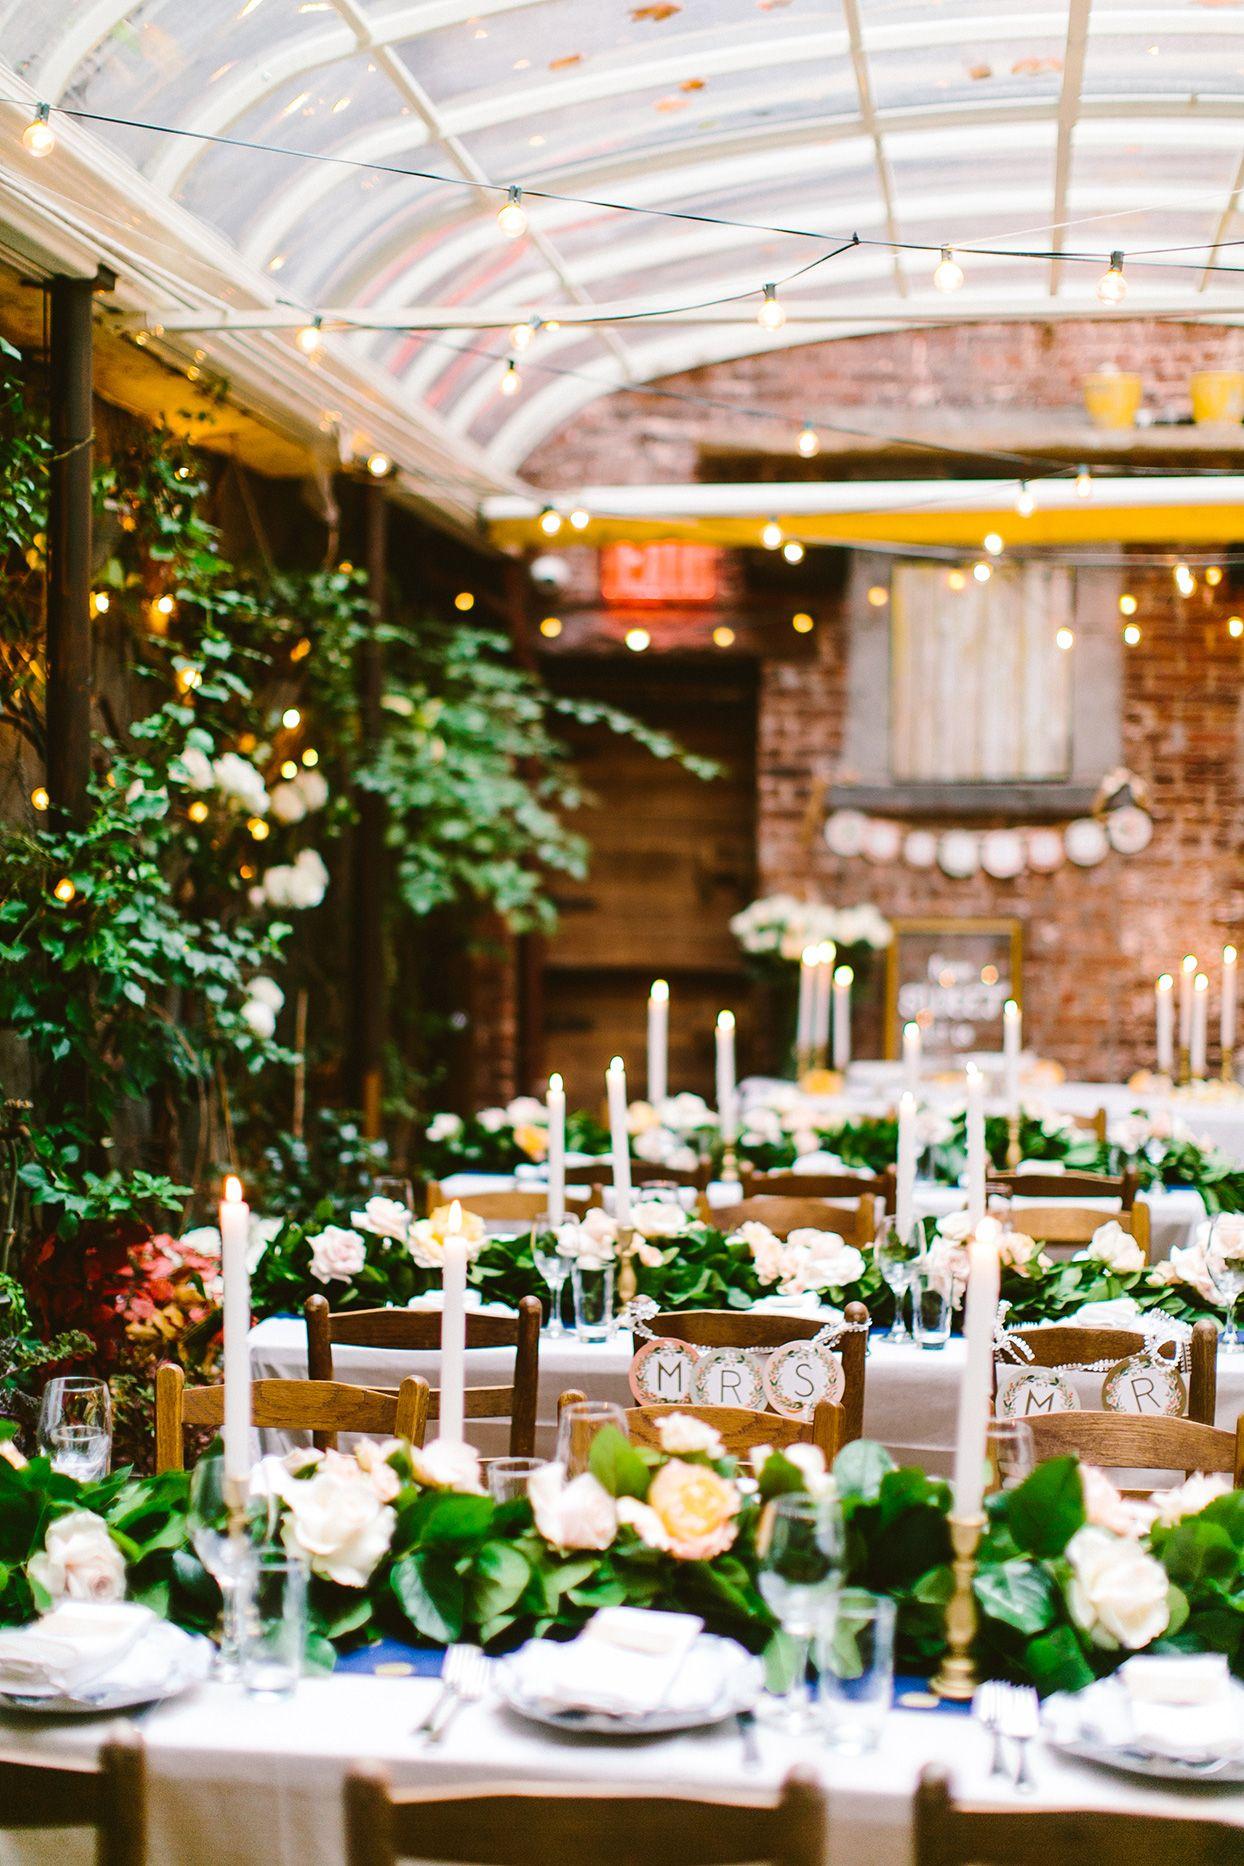 Our Favorite Restaurant Wedding Décor Ideas | Restaurant ...